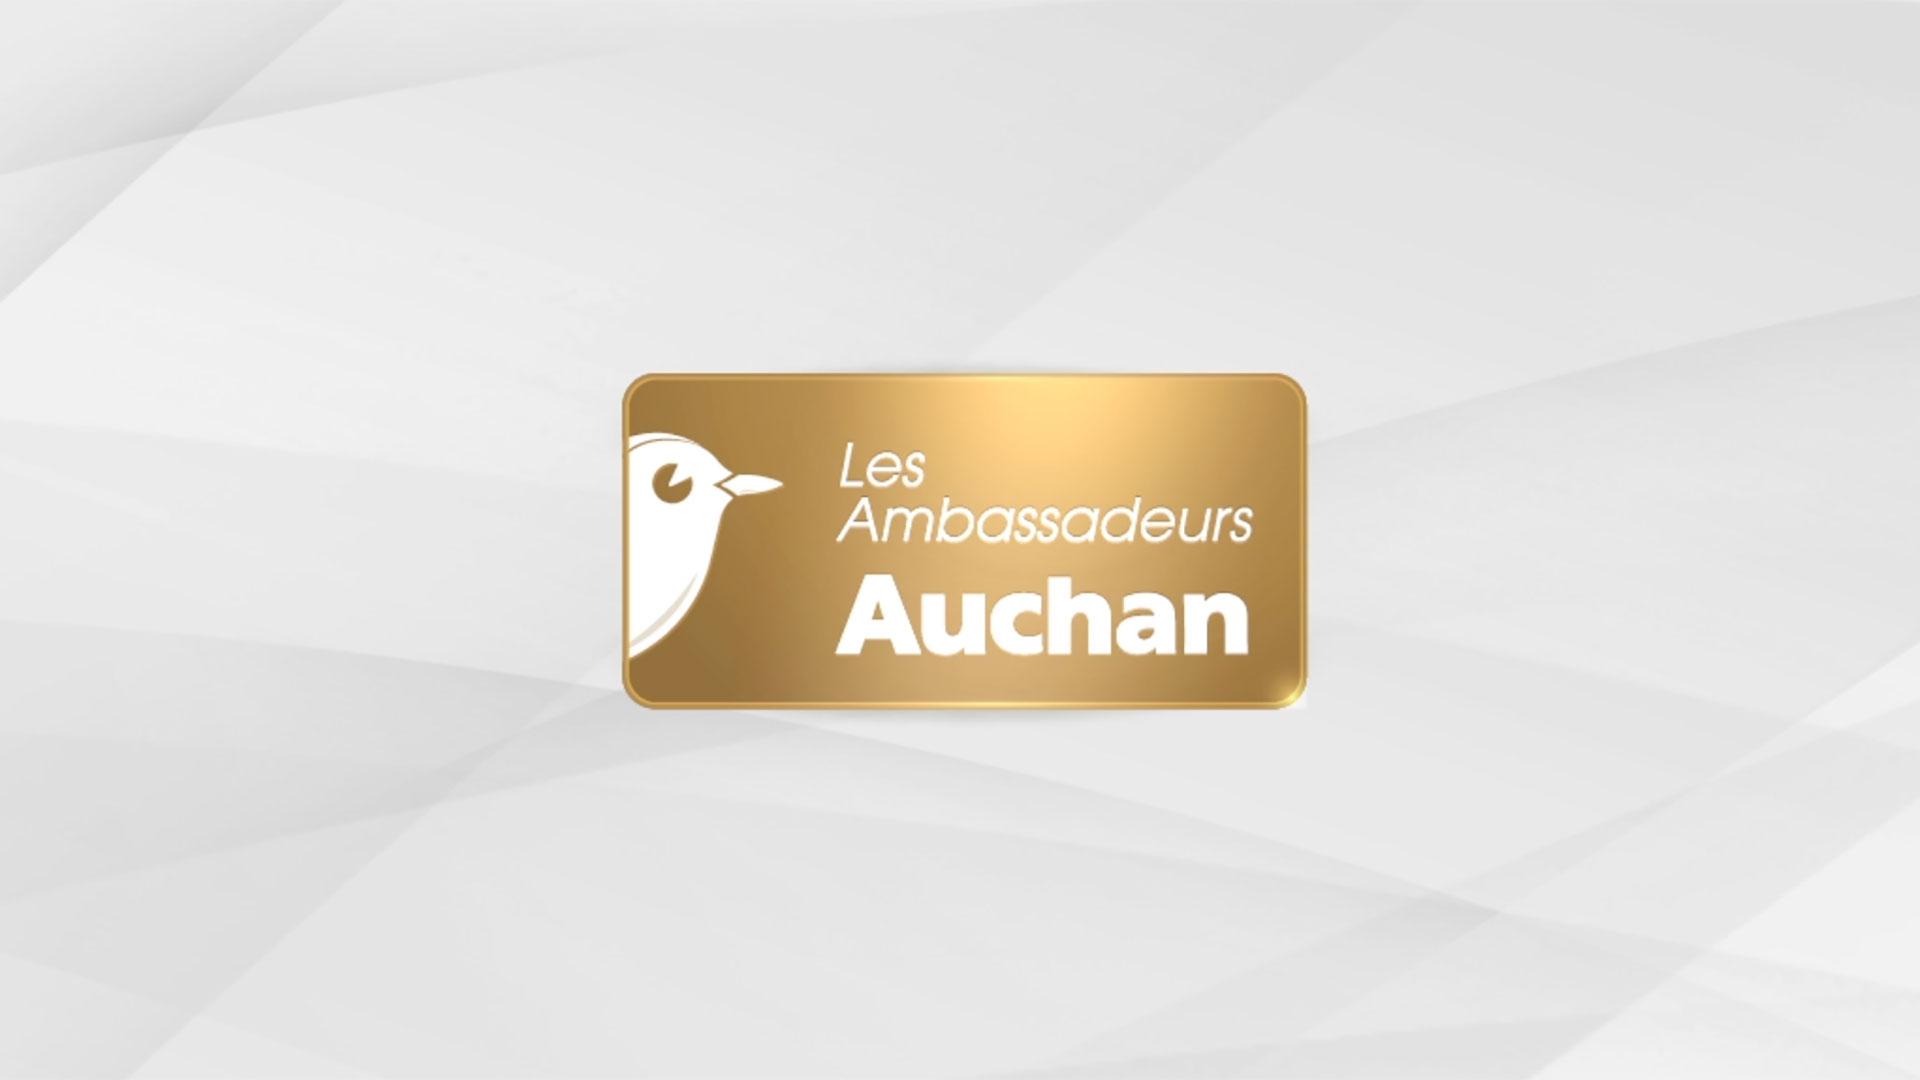 LES AMBASSADEURS AUCHAN